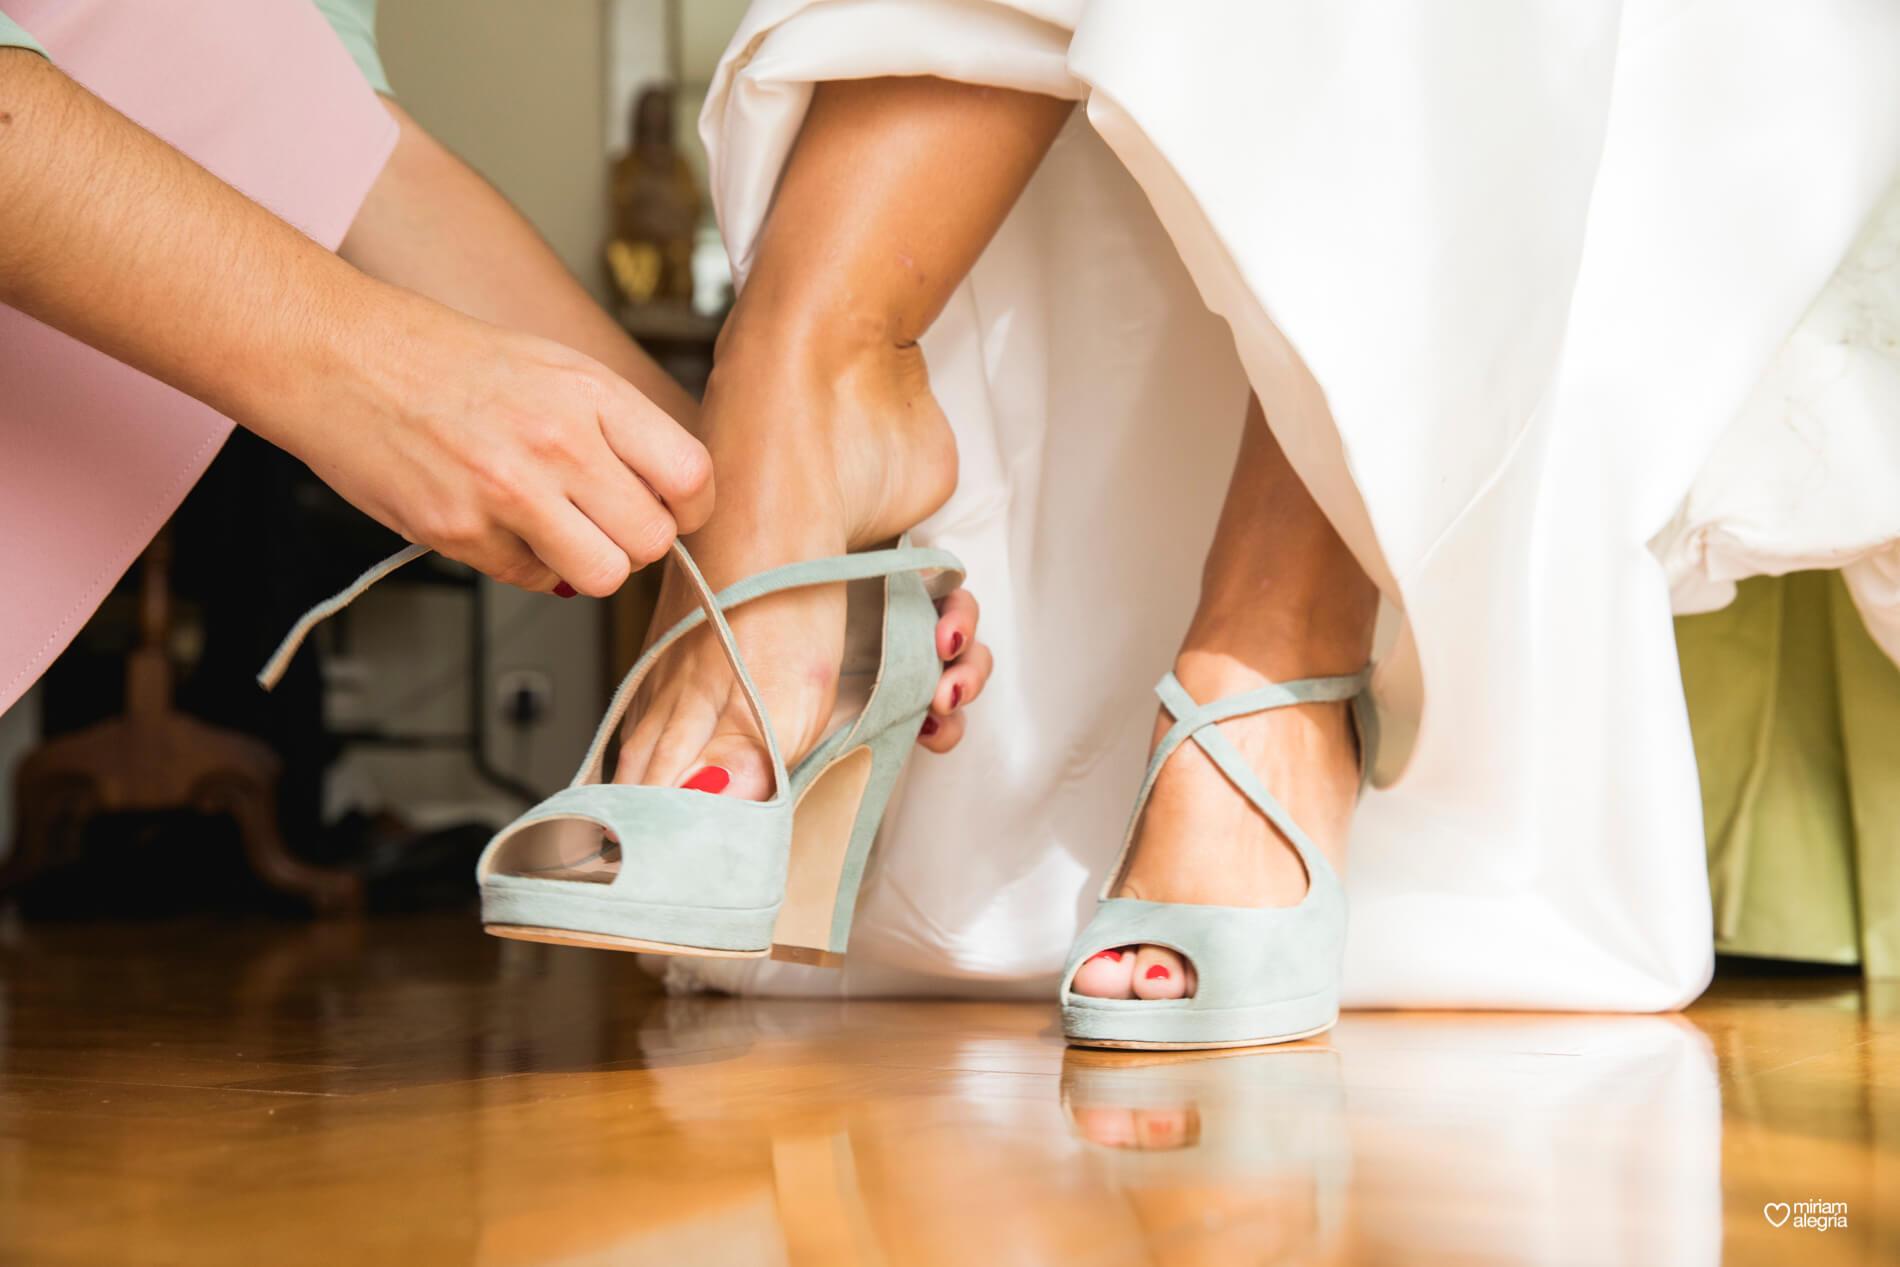 vestido-de-novia-paula-del-vas-miriam-alegria-fotografos-boda-murcia-24